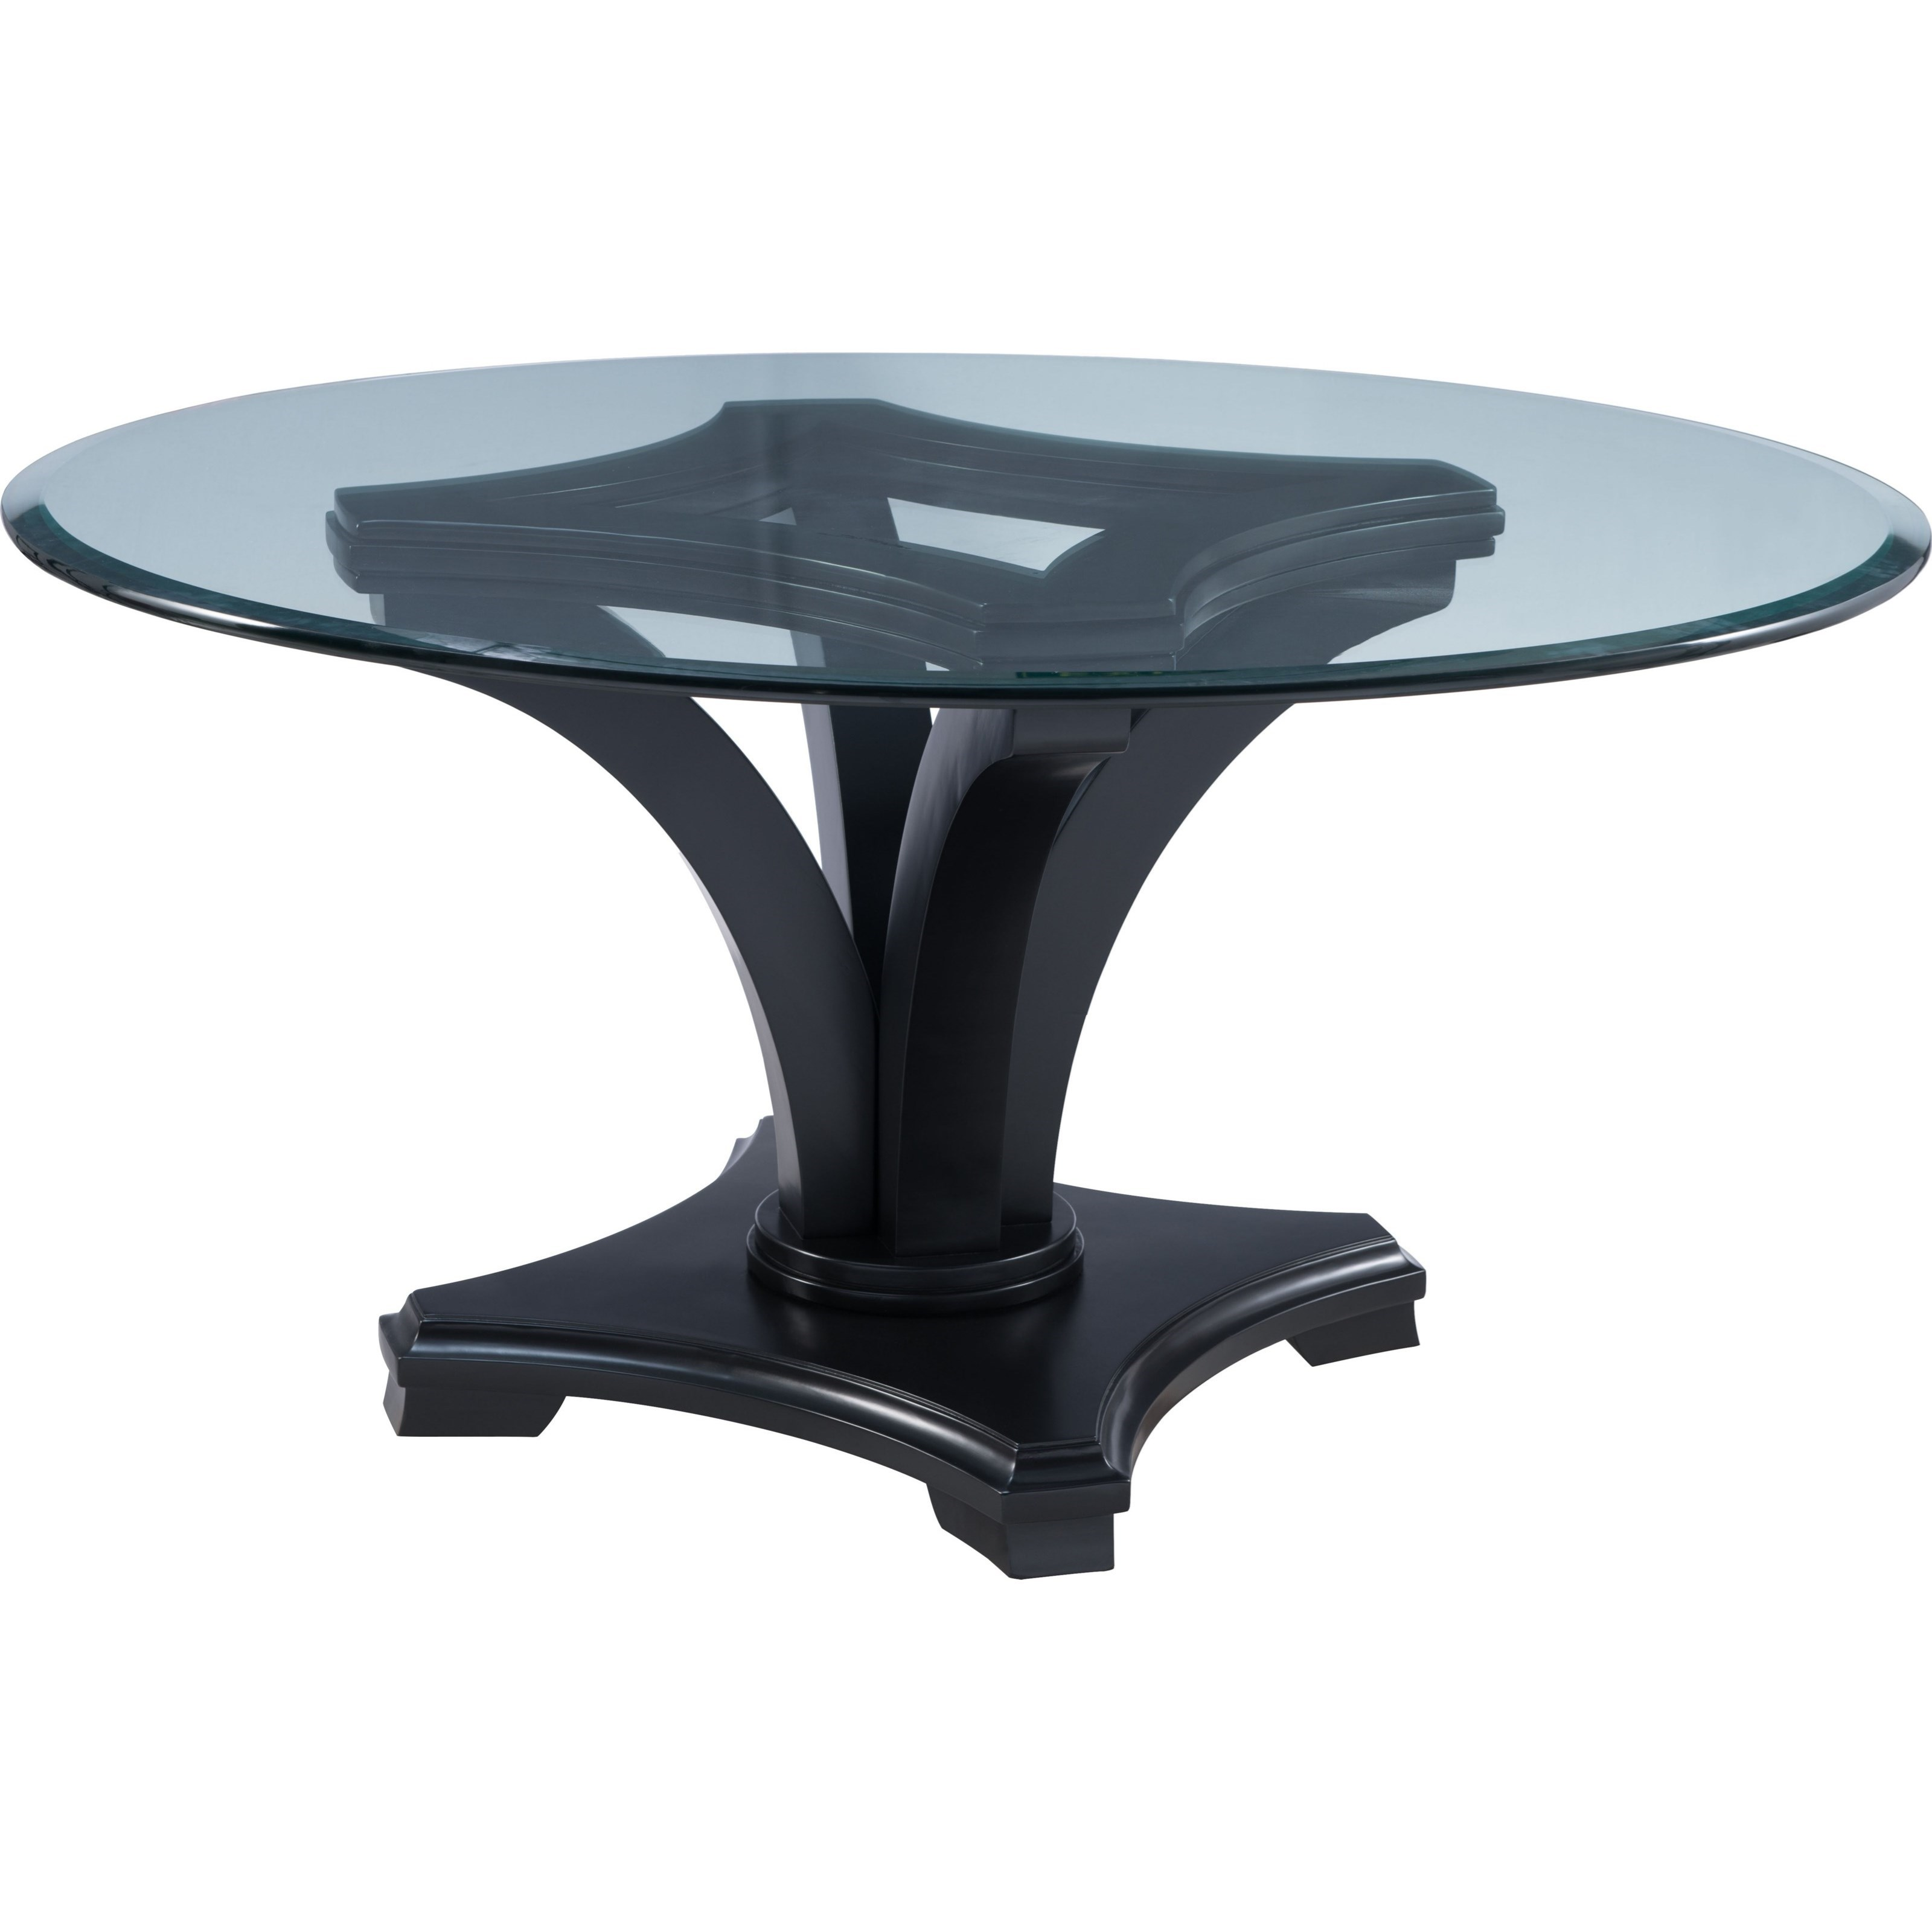 Thomasville® Manuscript Round Dining Table - Item Number: 82929-730-01GT+82929-730